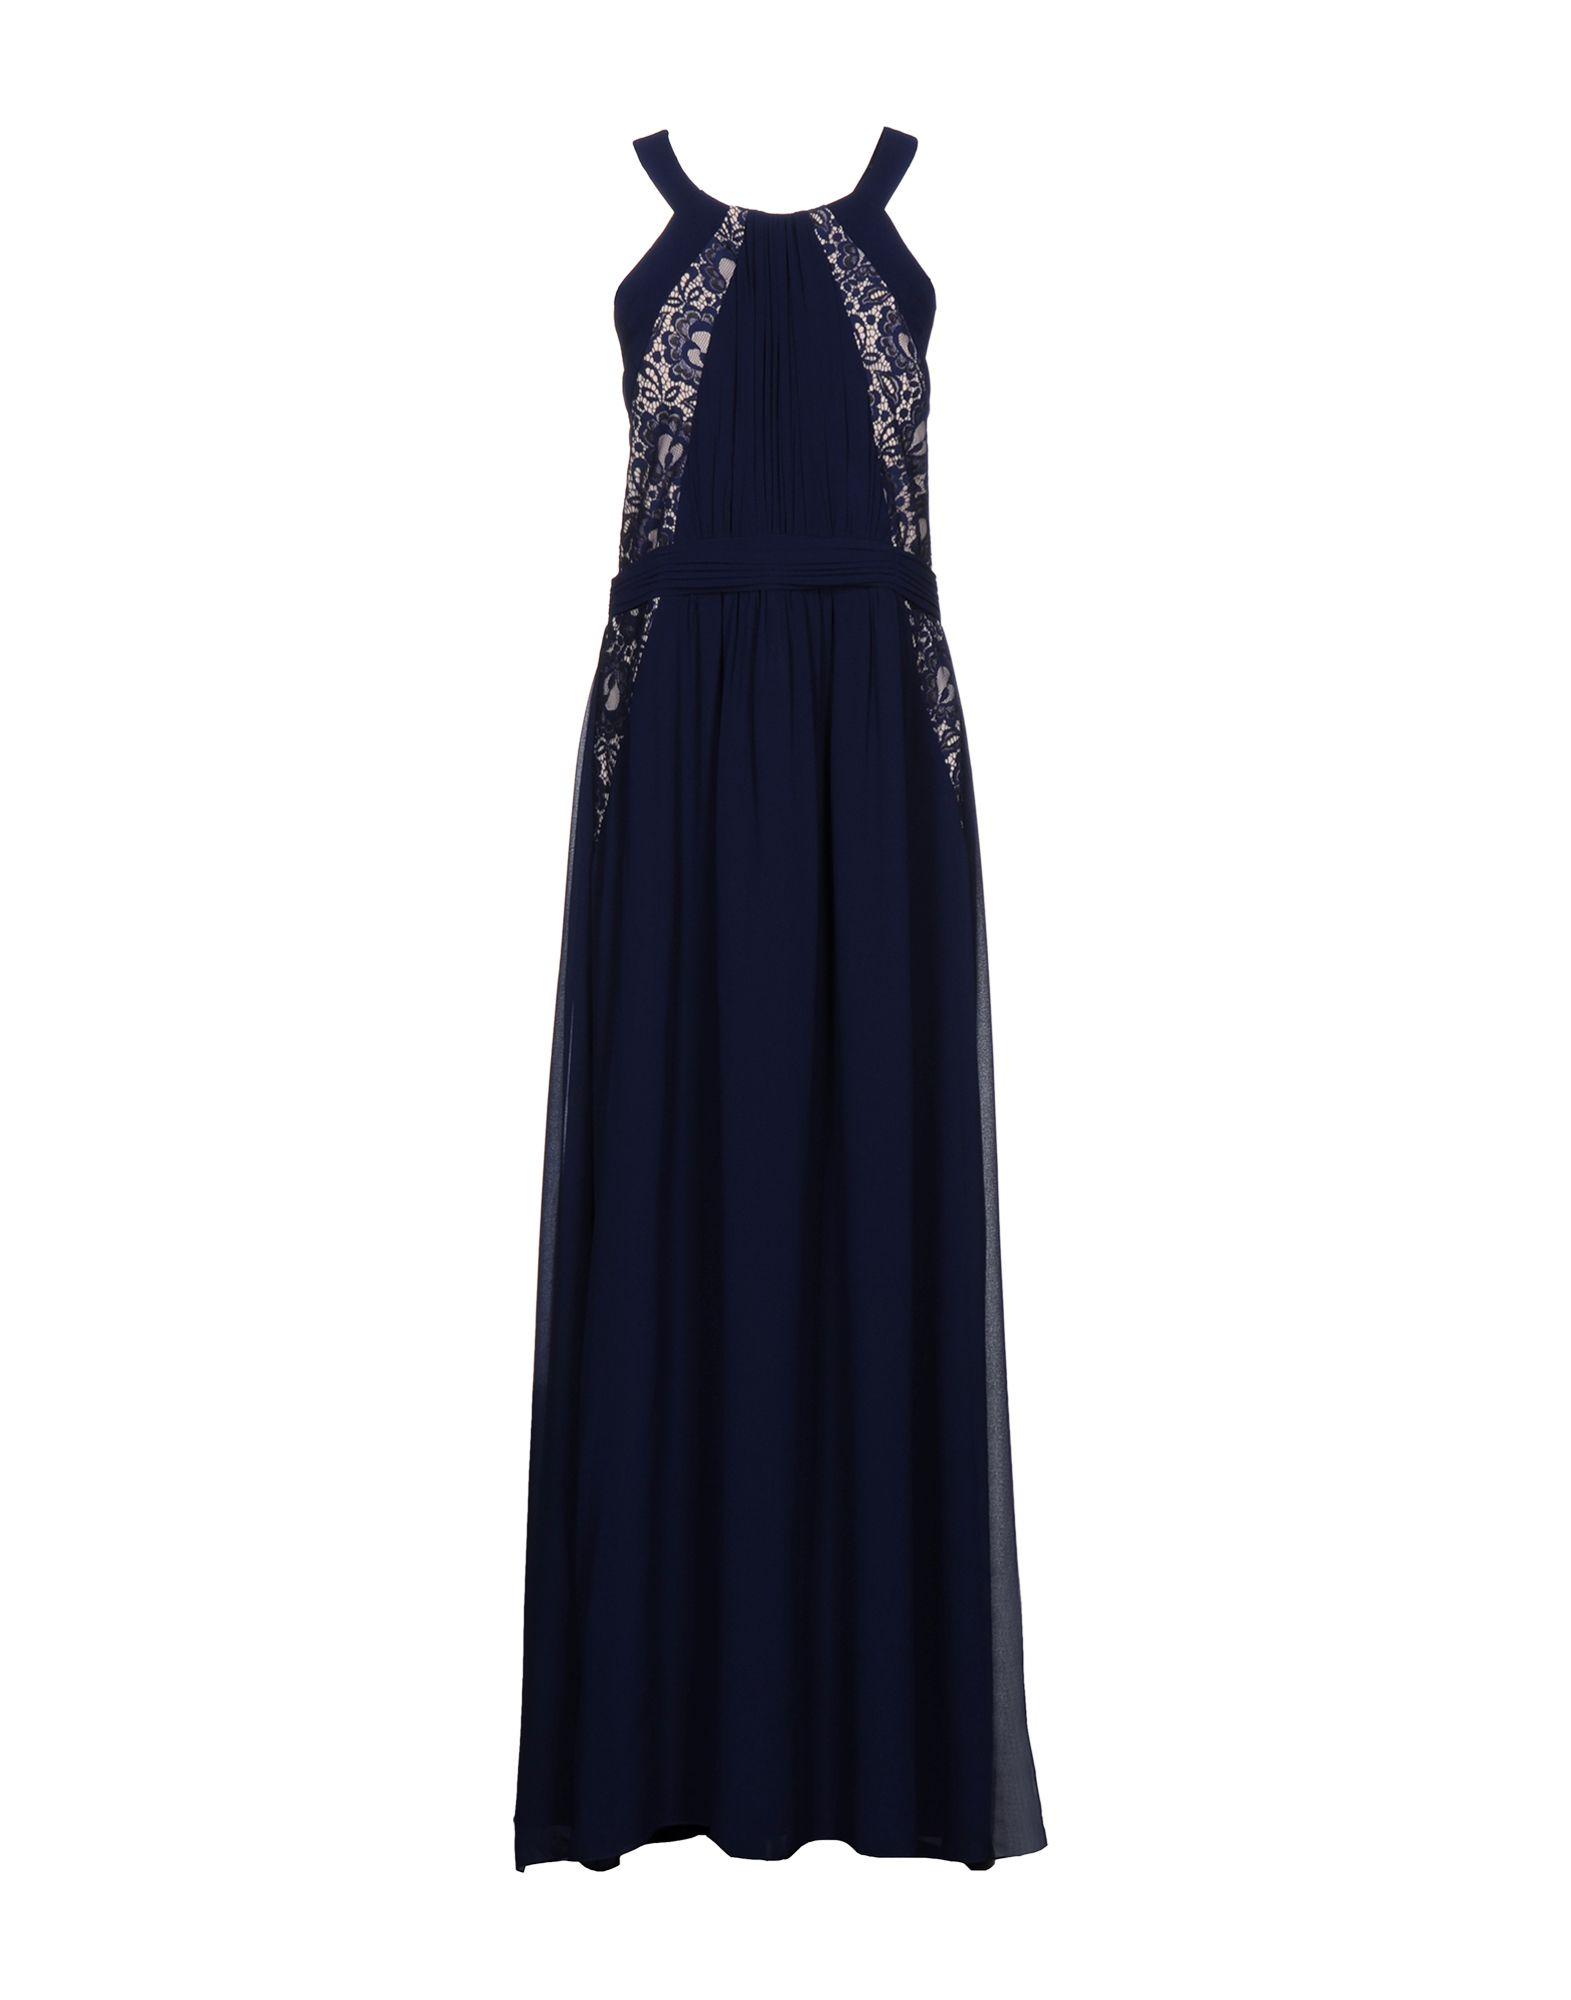 FOTI - LA BIELLESE Длинное платье manifatture alto biellese 1947 шарф